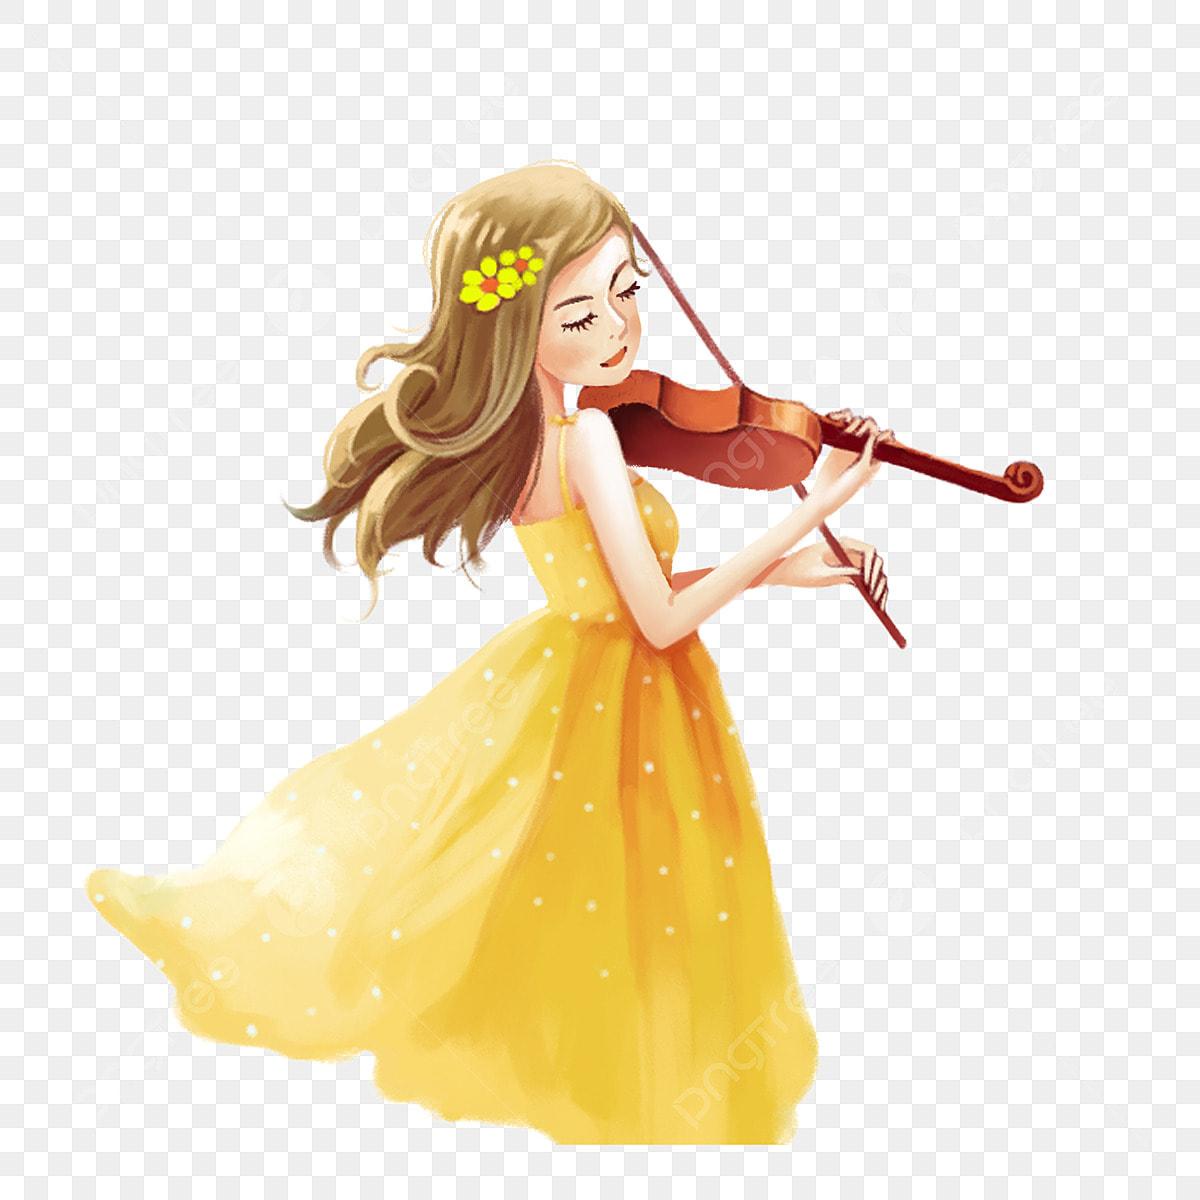 Cartoon Hand Painted Violin Girl, Cartoon Clipart, Violin